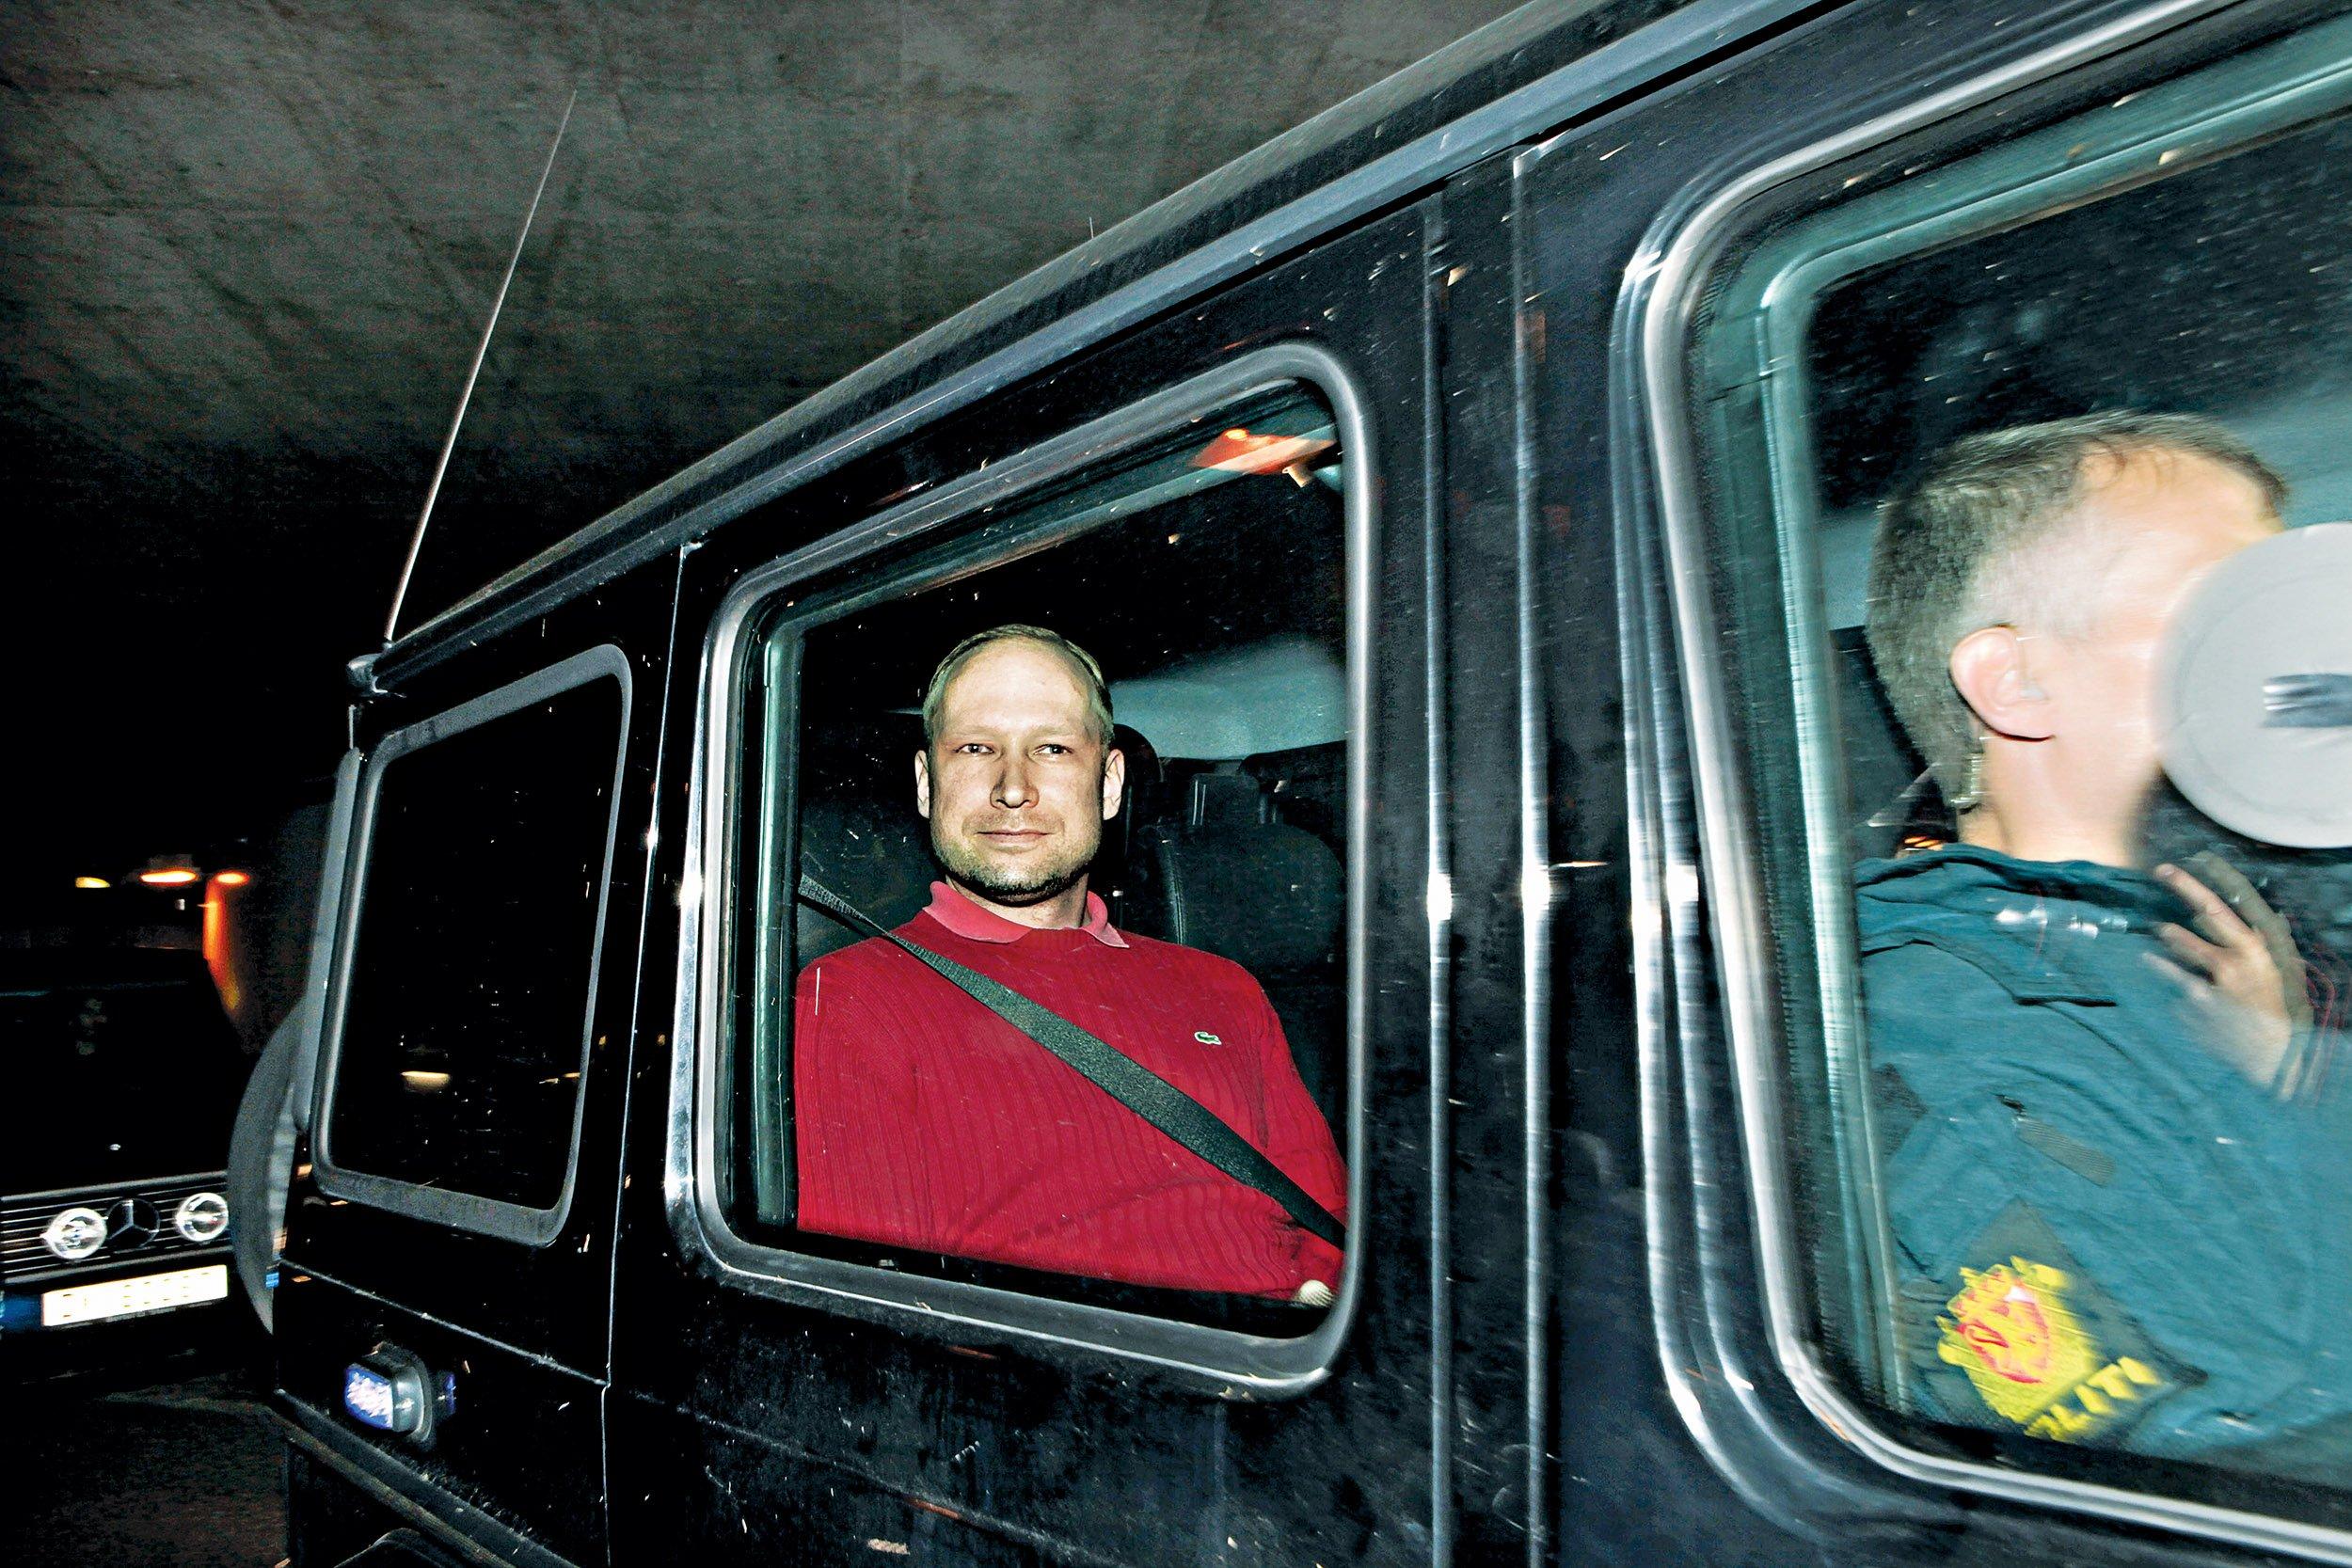 04_22_Breivik_06